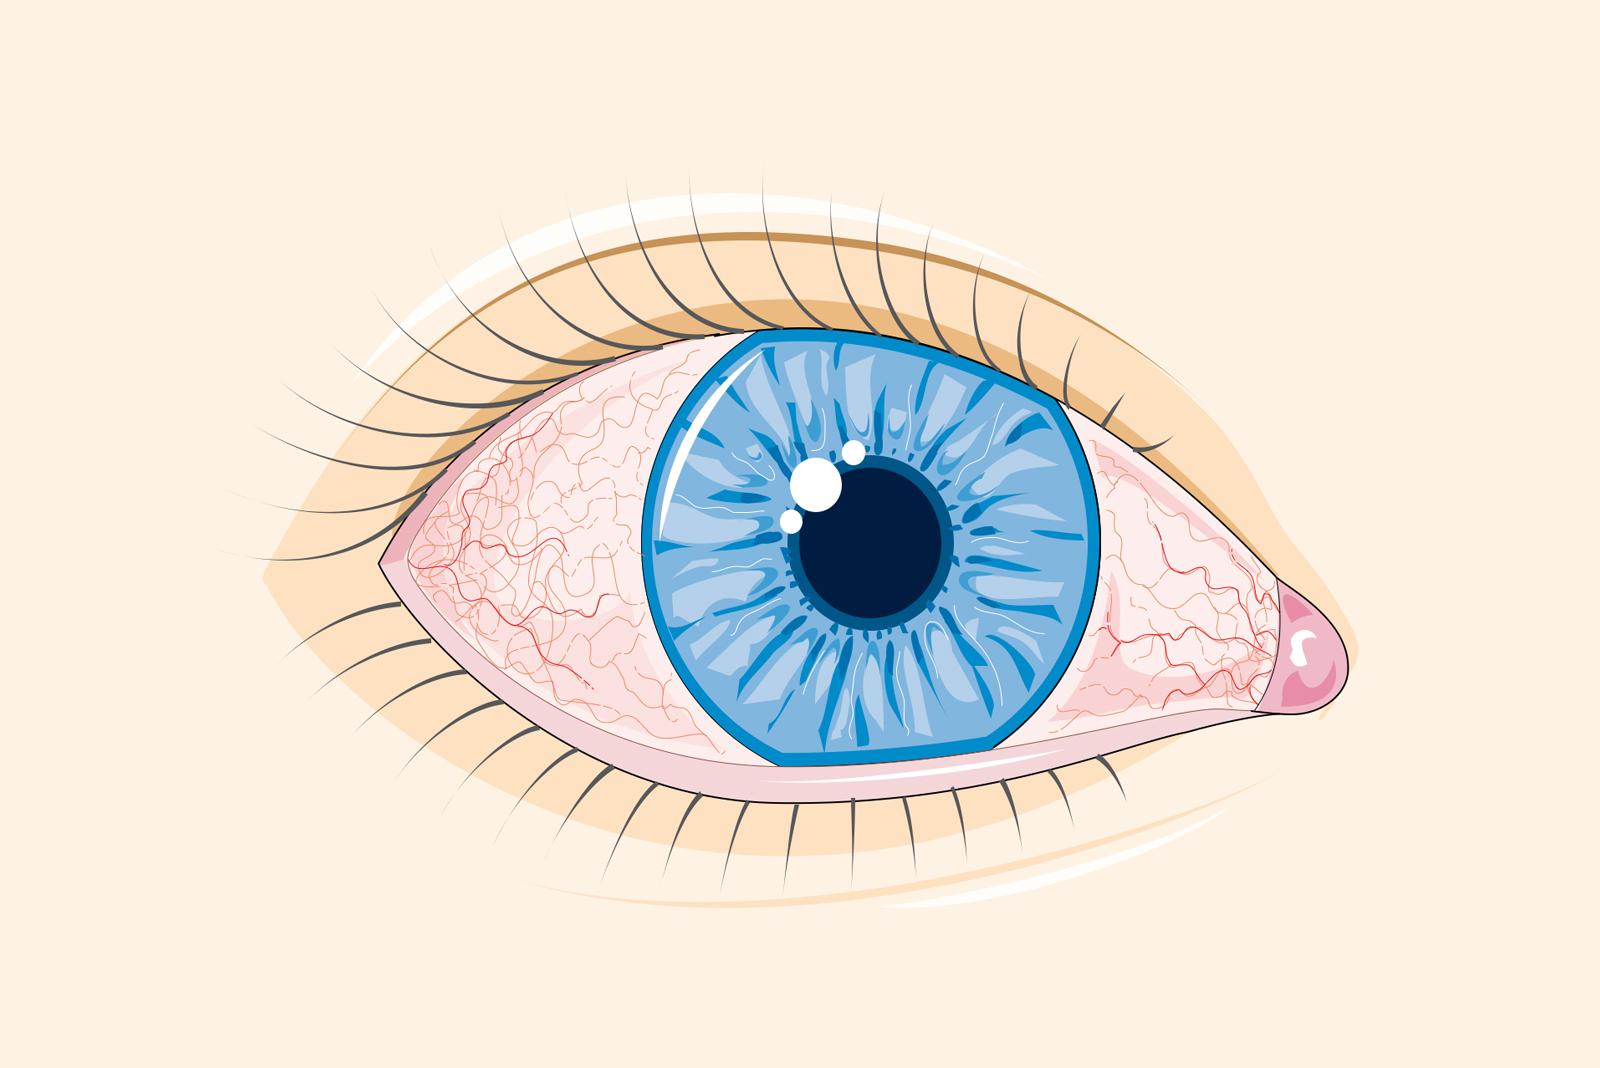 viziune slabă la un ochi